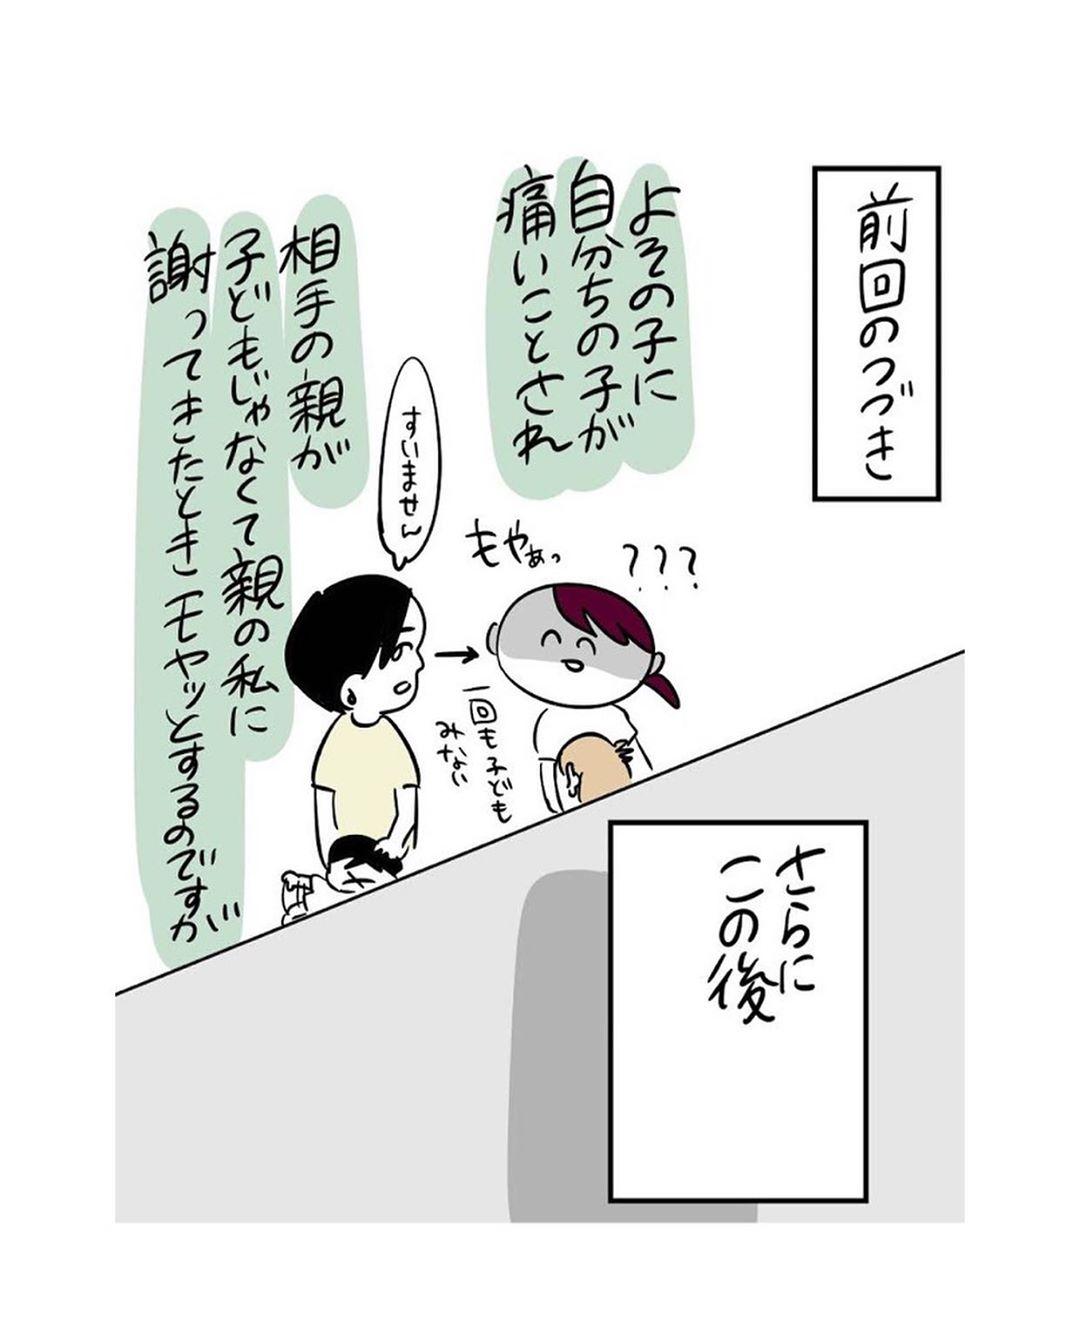 shirota.yunya_72961324_810588689388009_4762979918872169376_n